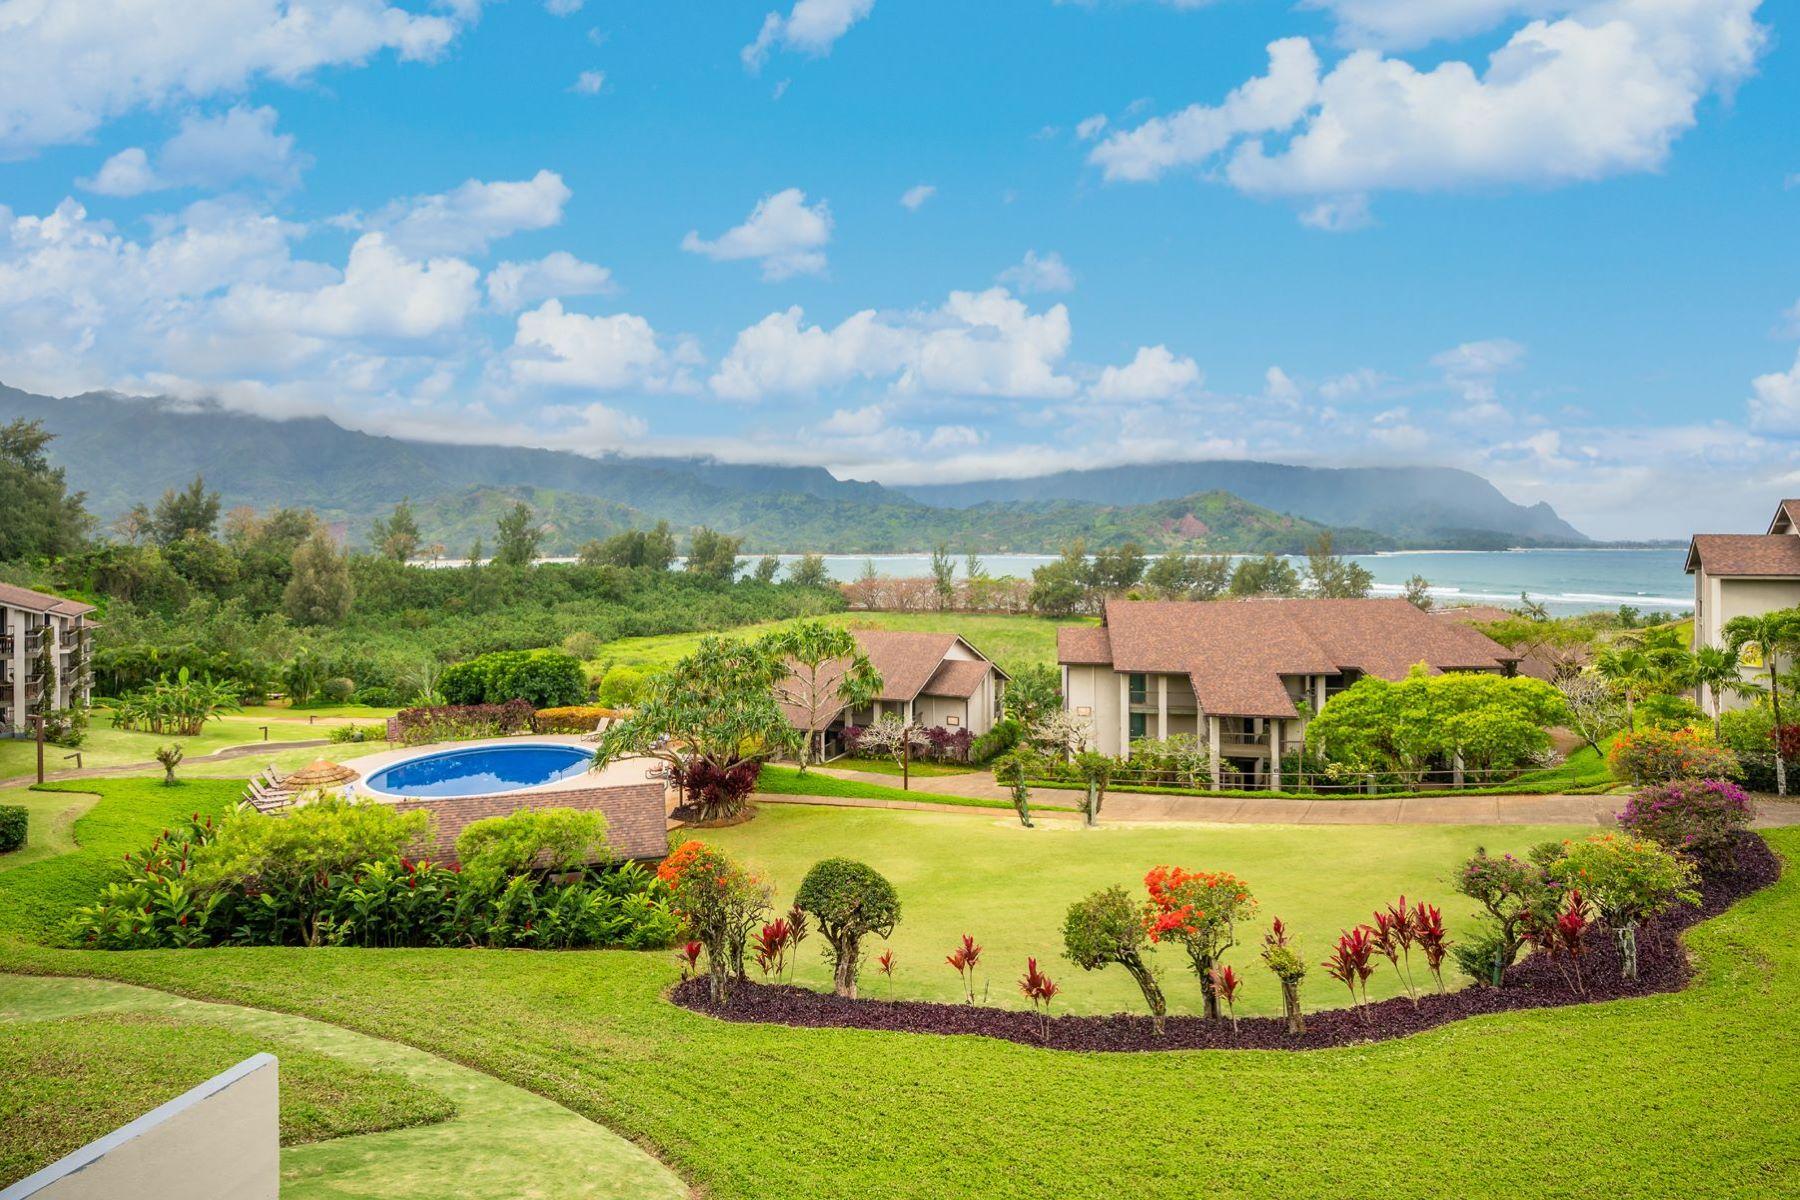 Condominiums 为 销售 在 5380 HONOIKI RD #L28 PRINCEVILLE, HI 96722 5380 HONOIKI RD #L28 普林斯维尔, 夏威夷 96722 美国